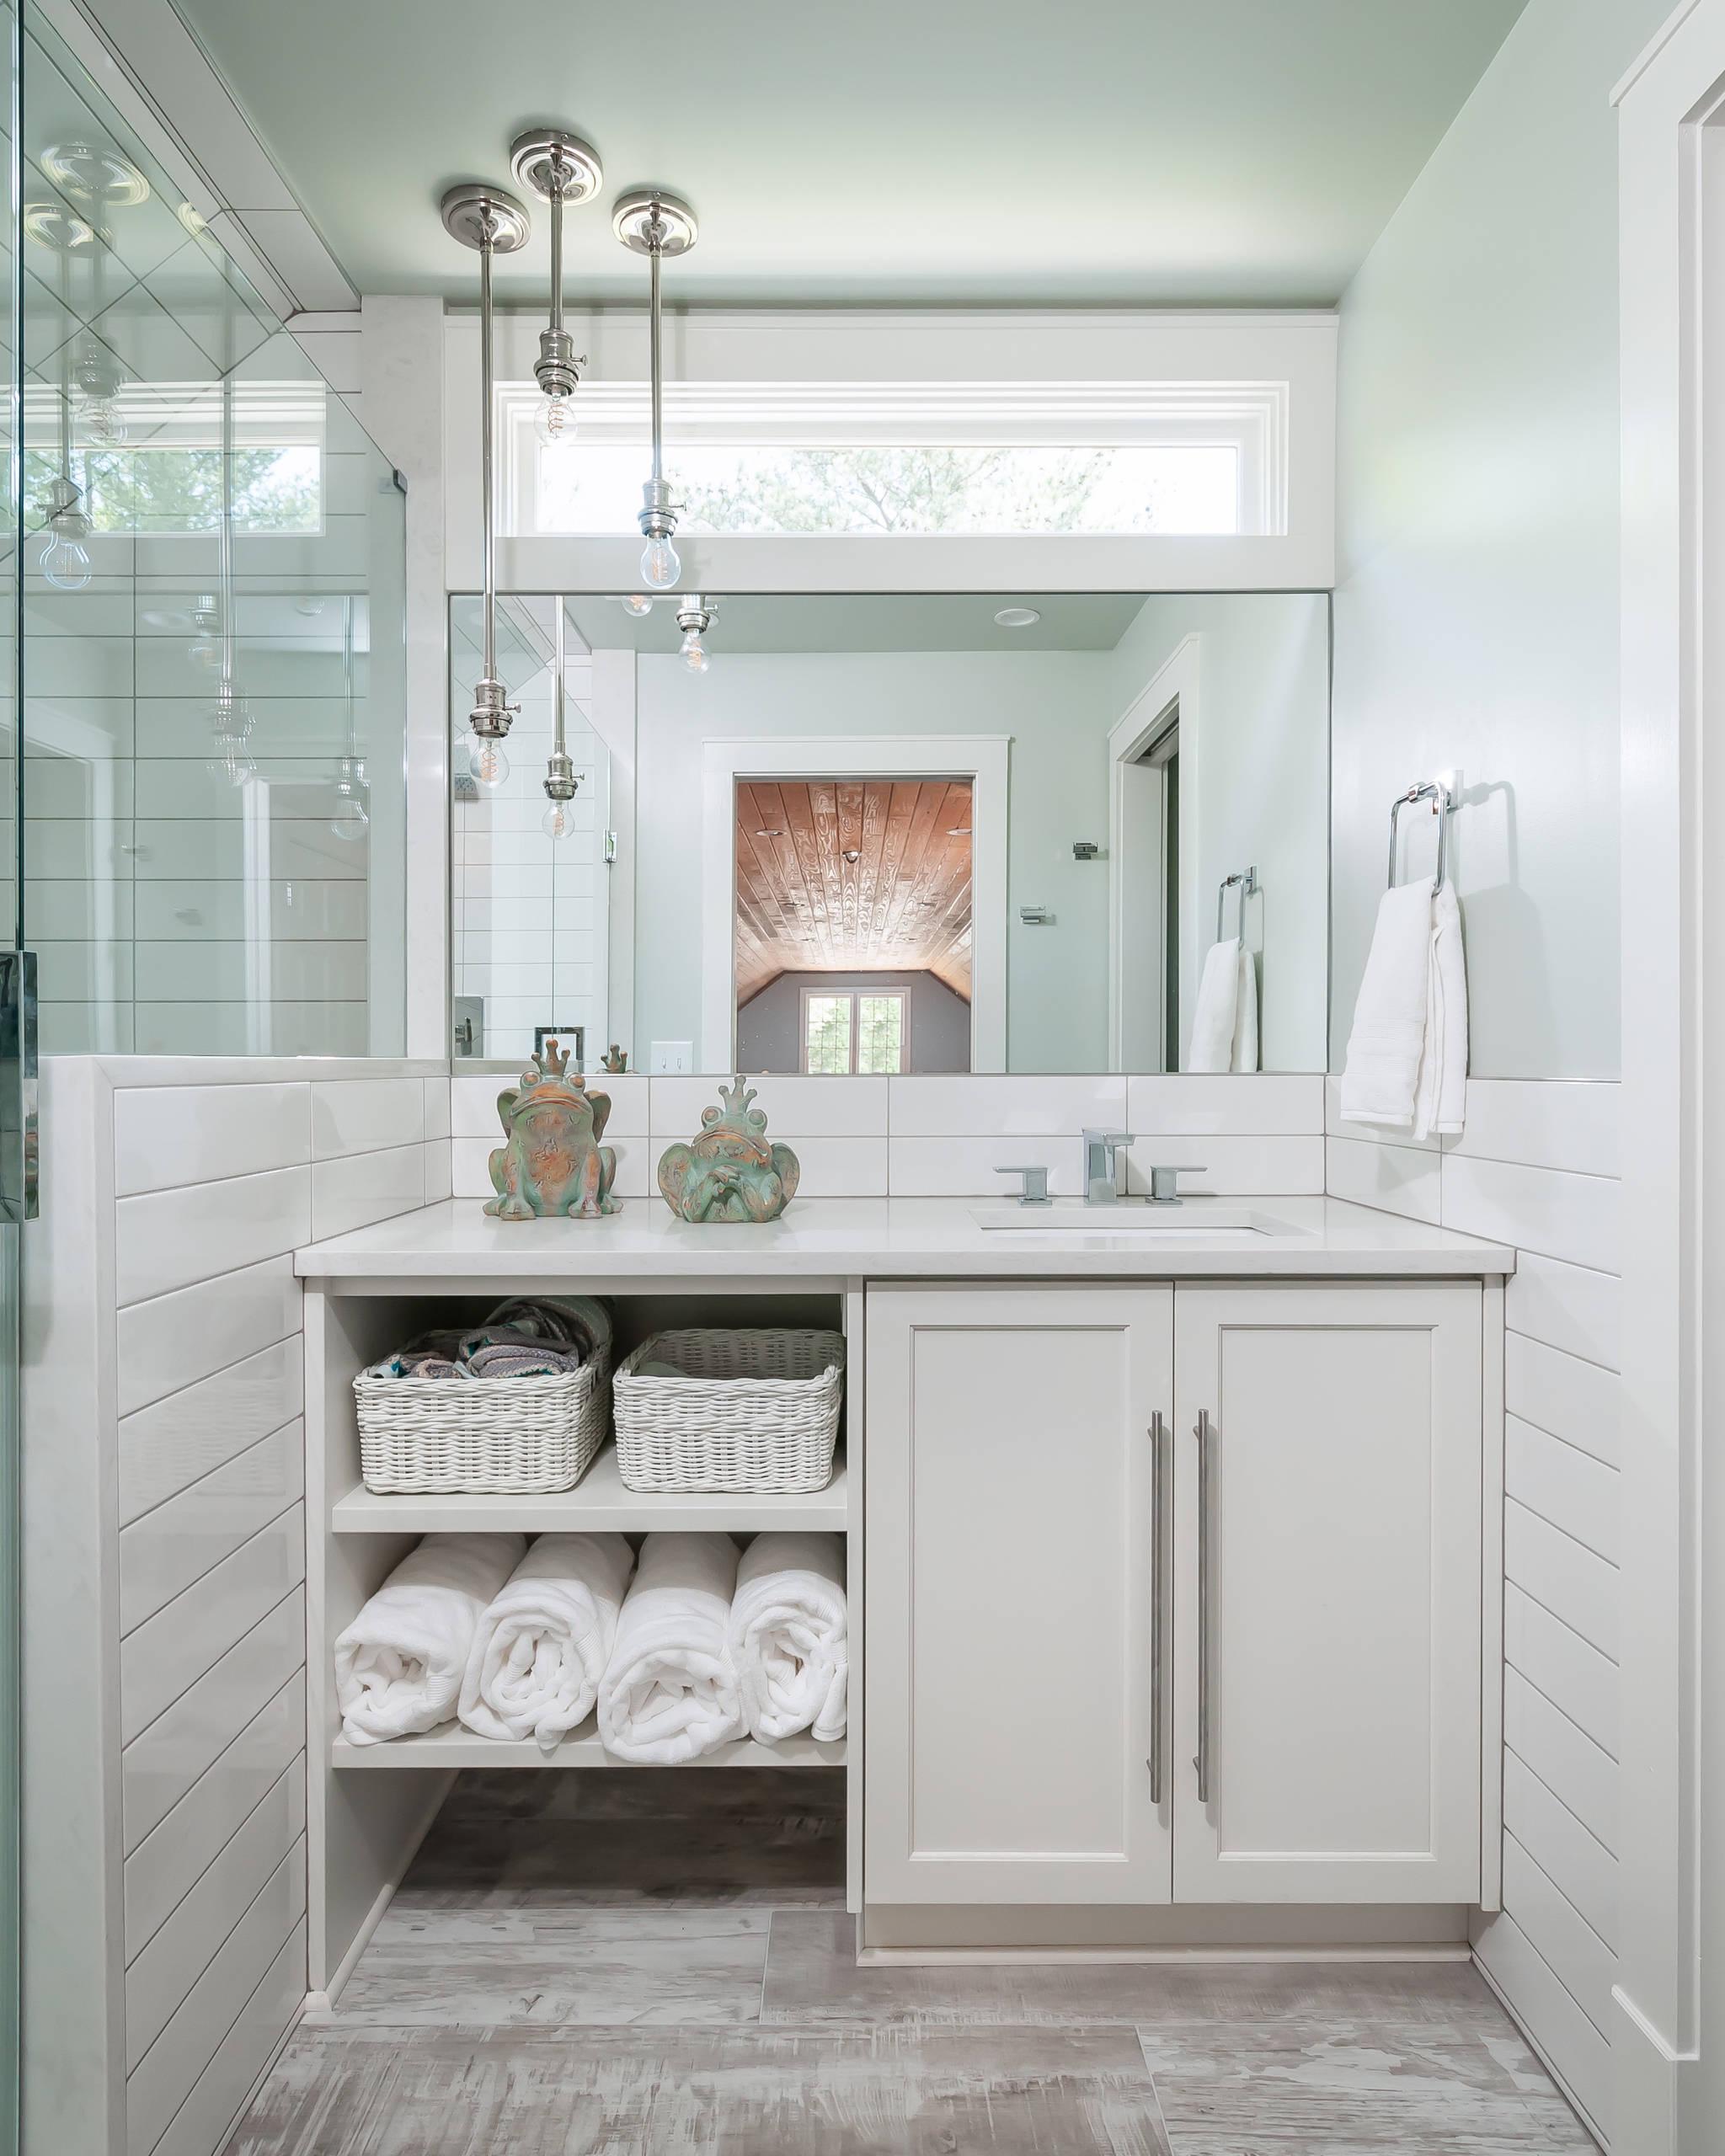 8 Beautiful Small Coastal Bathroom Pictures & Ideas - October